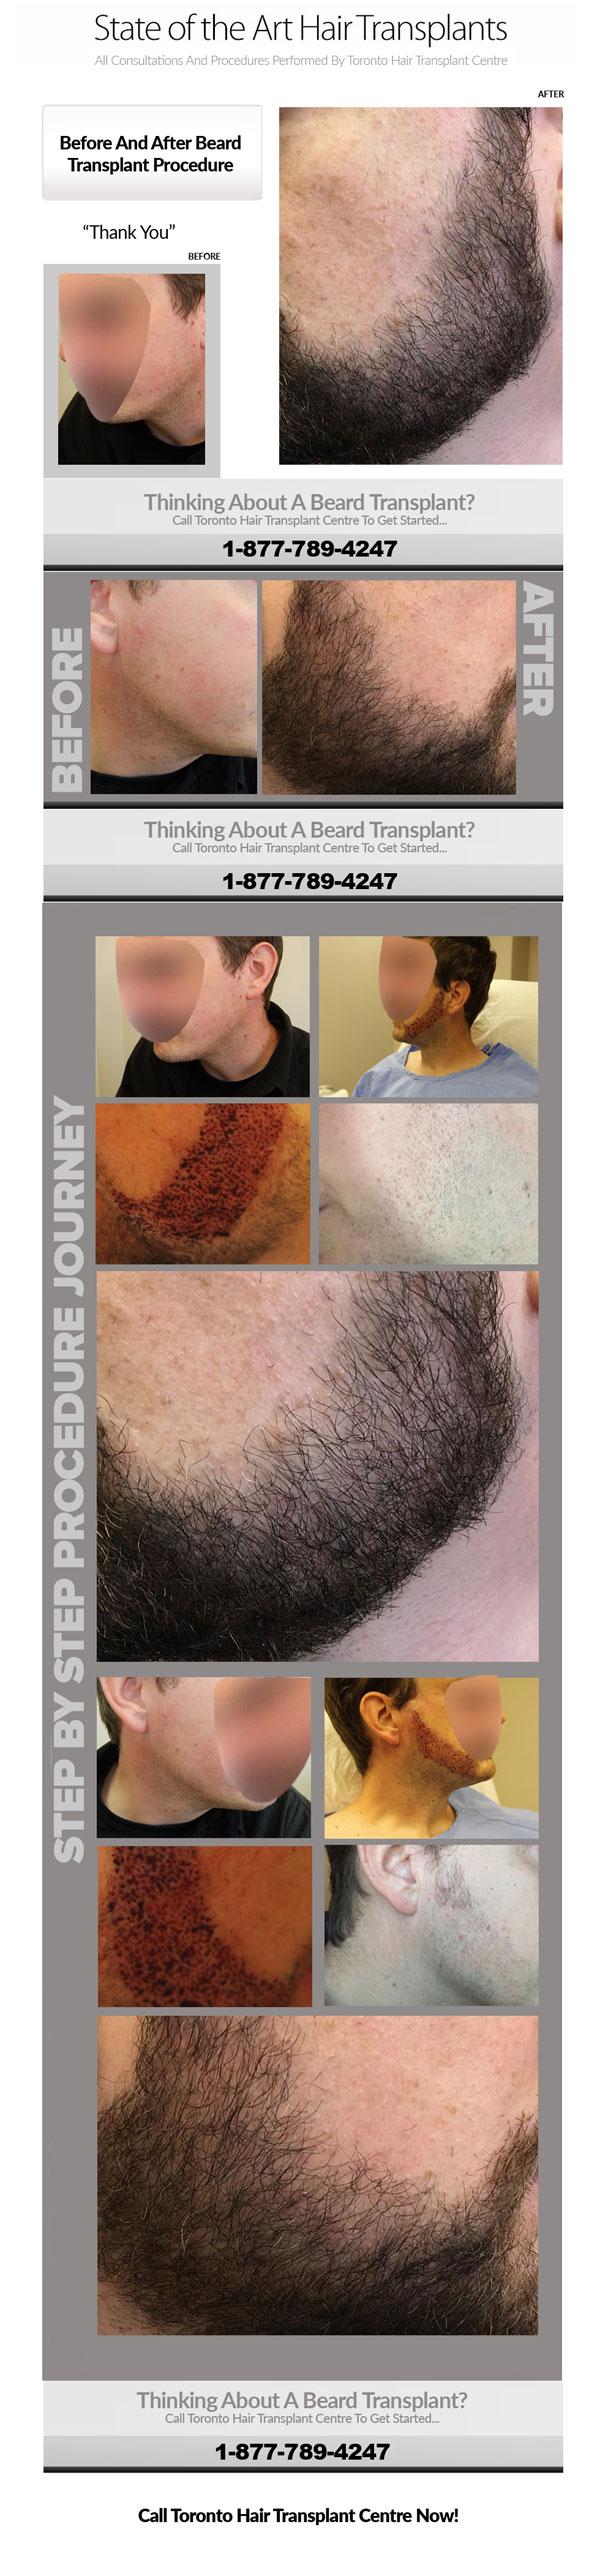 Beard-Transplants-Case-Study